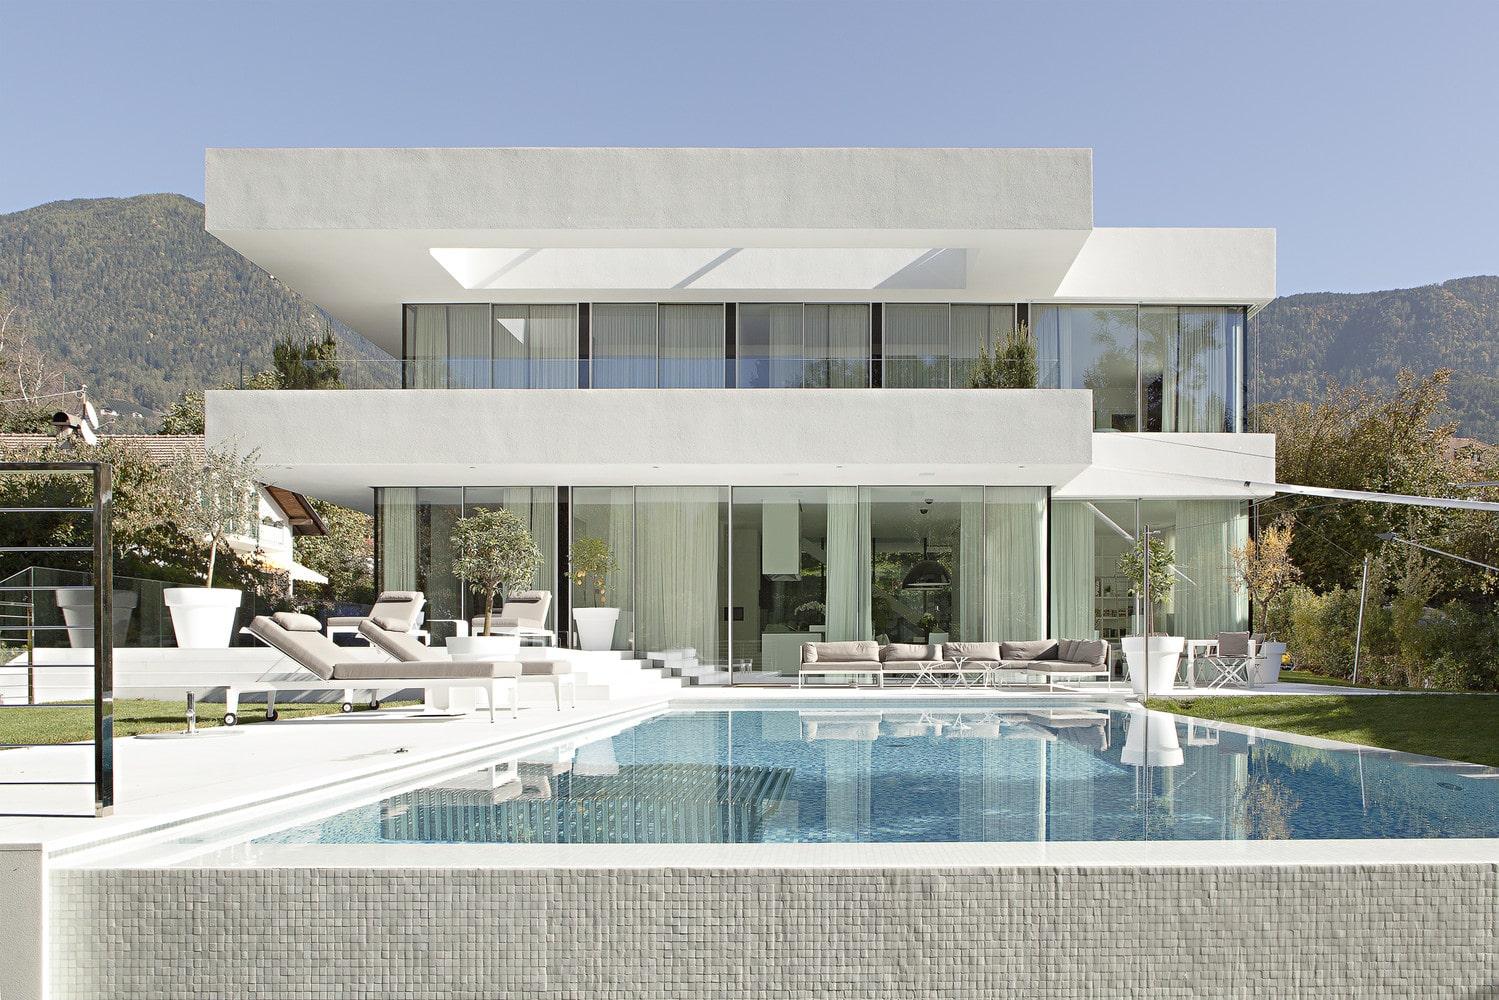 House M от архитекторов студии The Monovolume Architecture + Design в Мерано